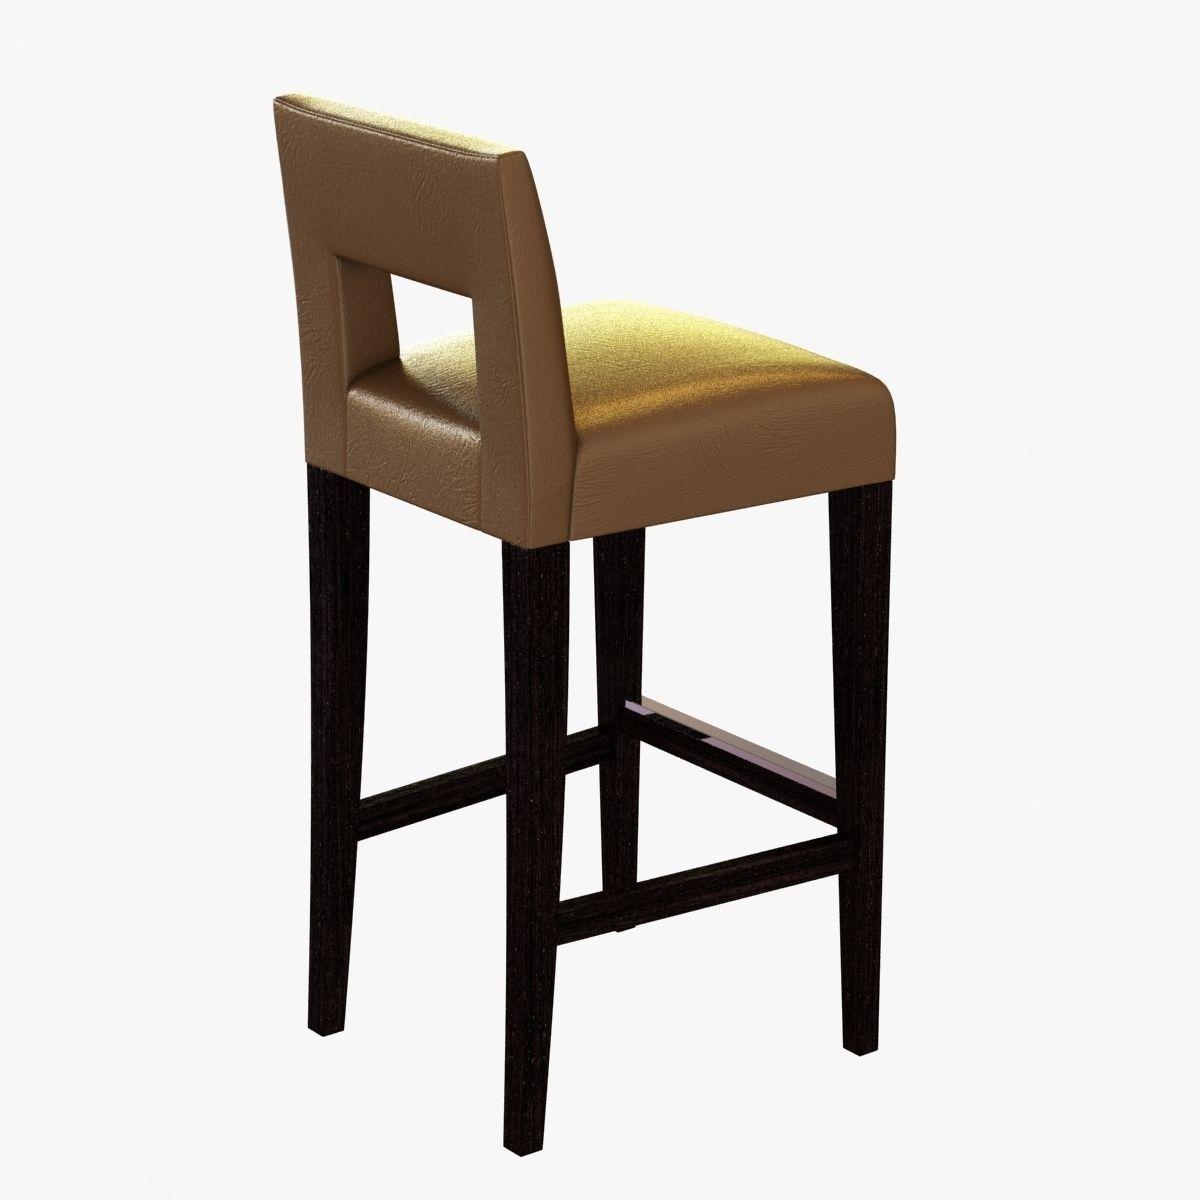 3D sofa and chair company hugo bar stool | CGTrader